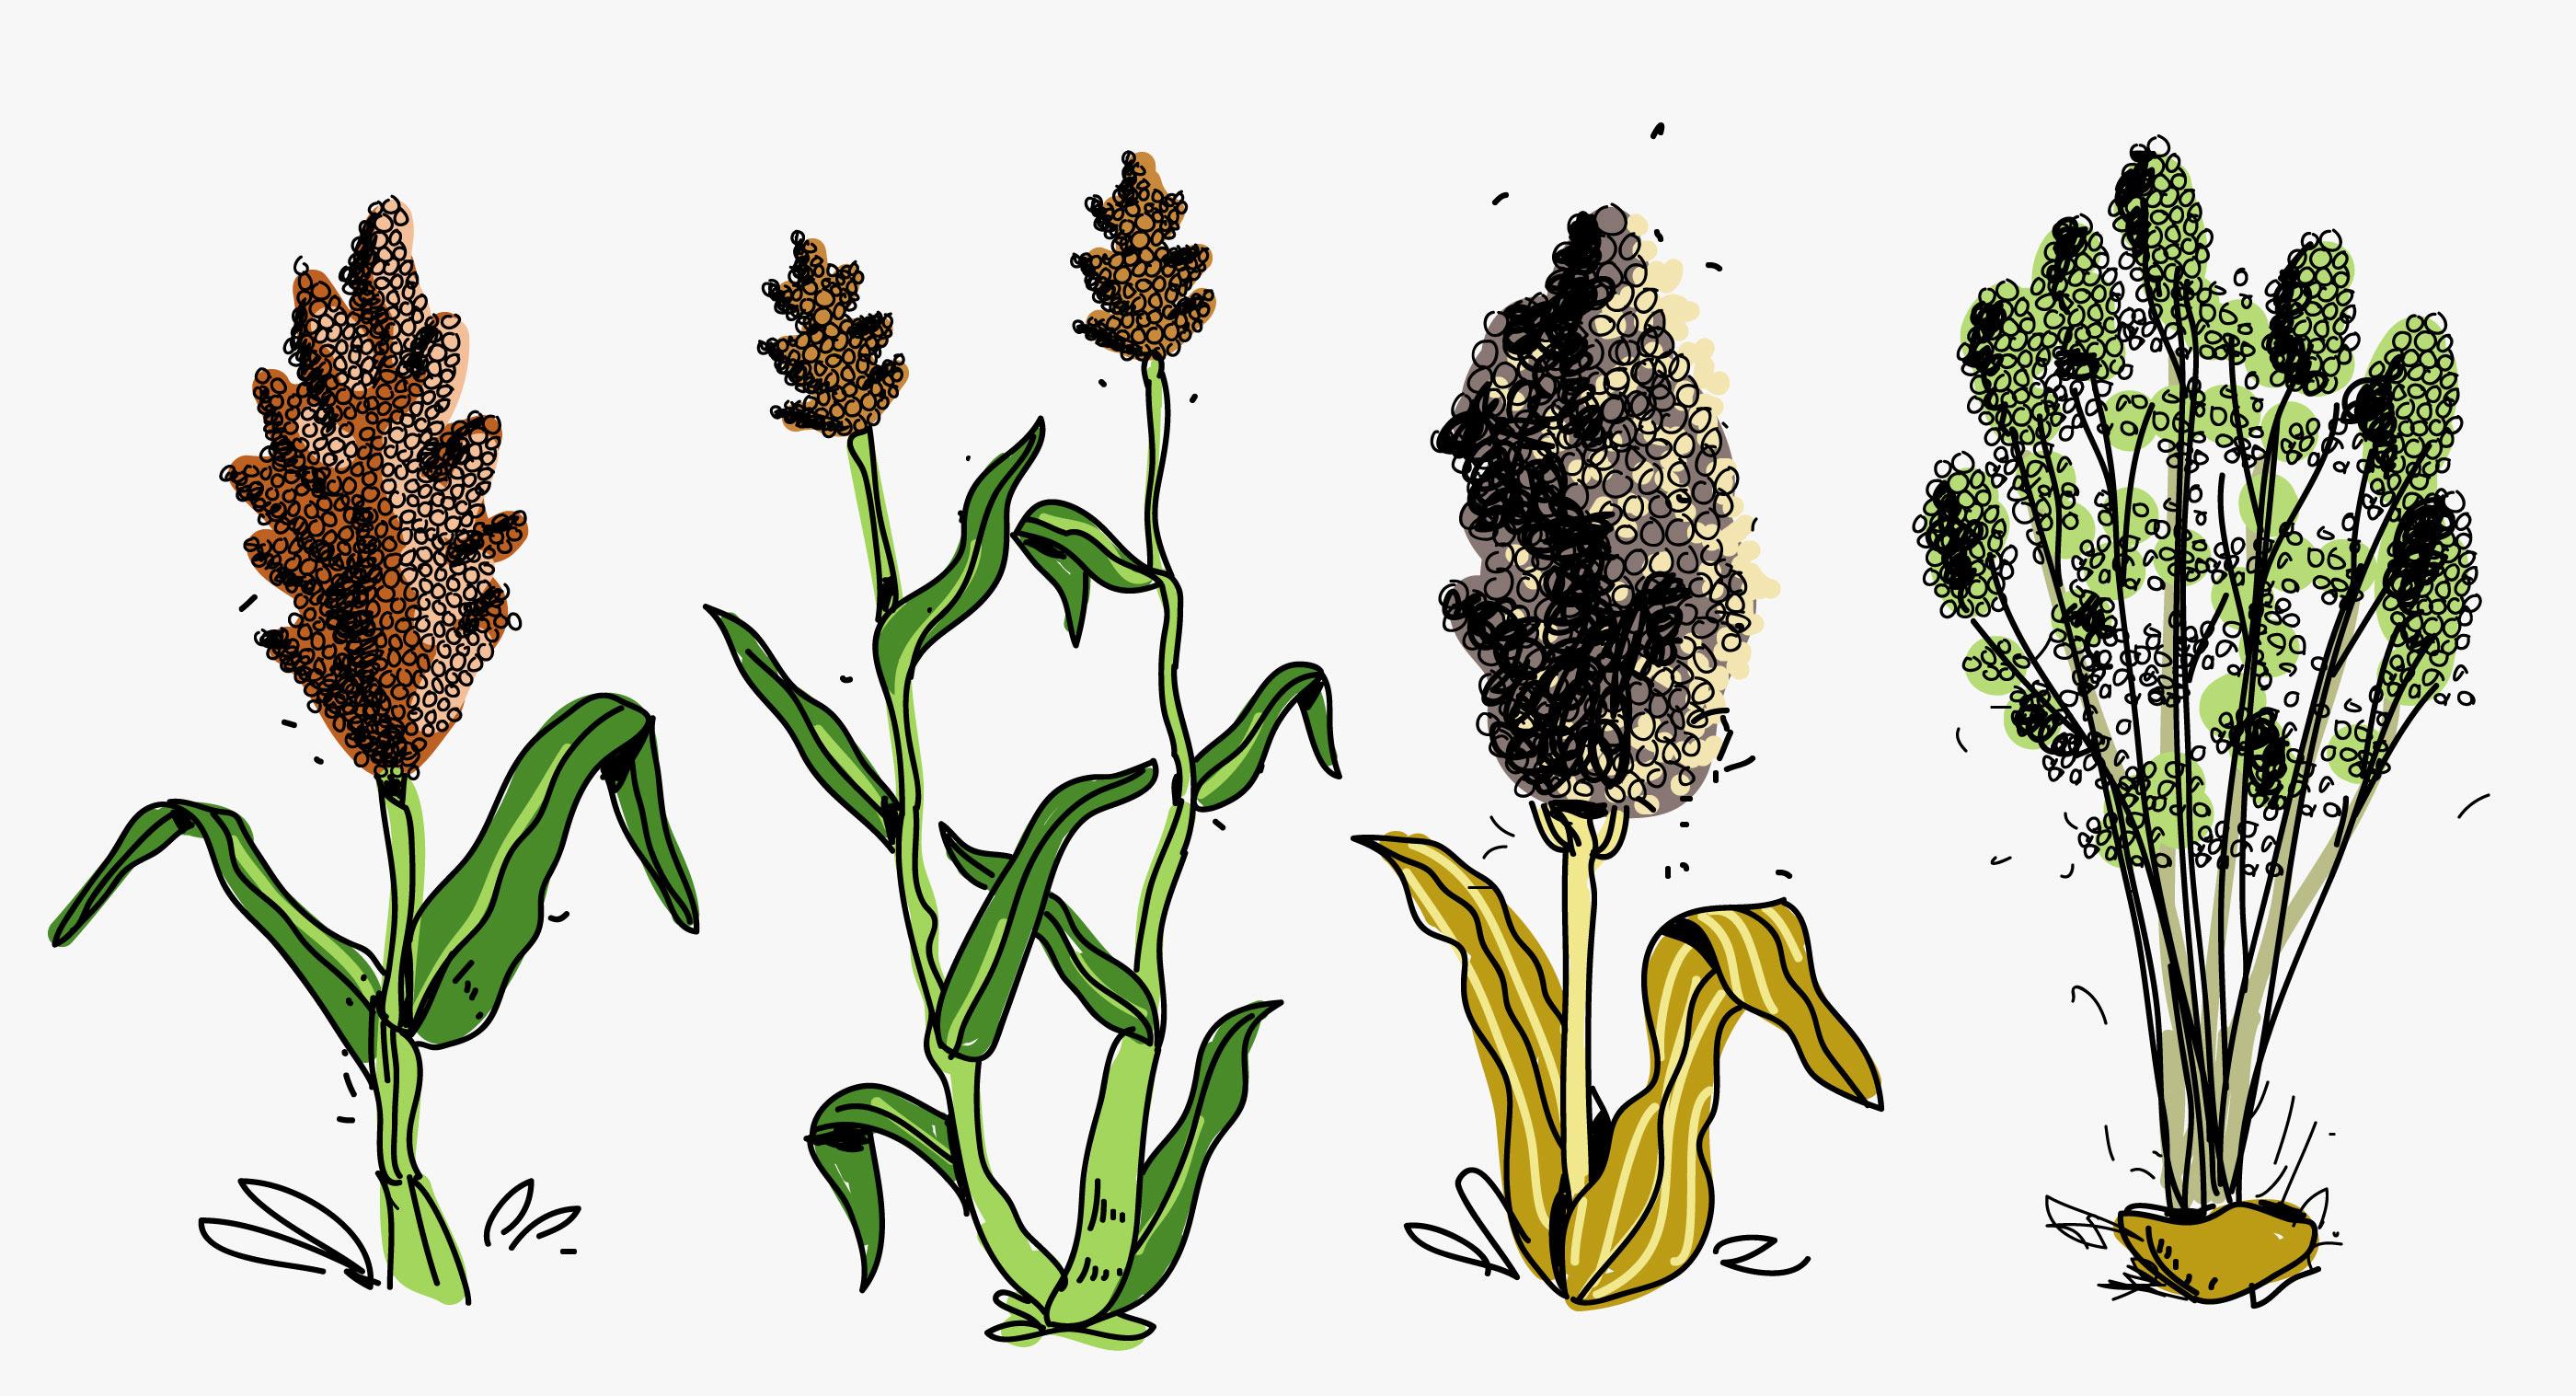 sorghum harvest hand drawn vector illustration